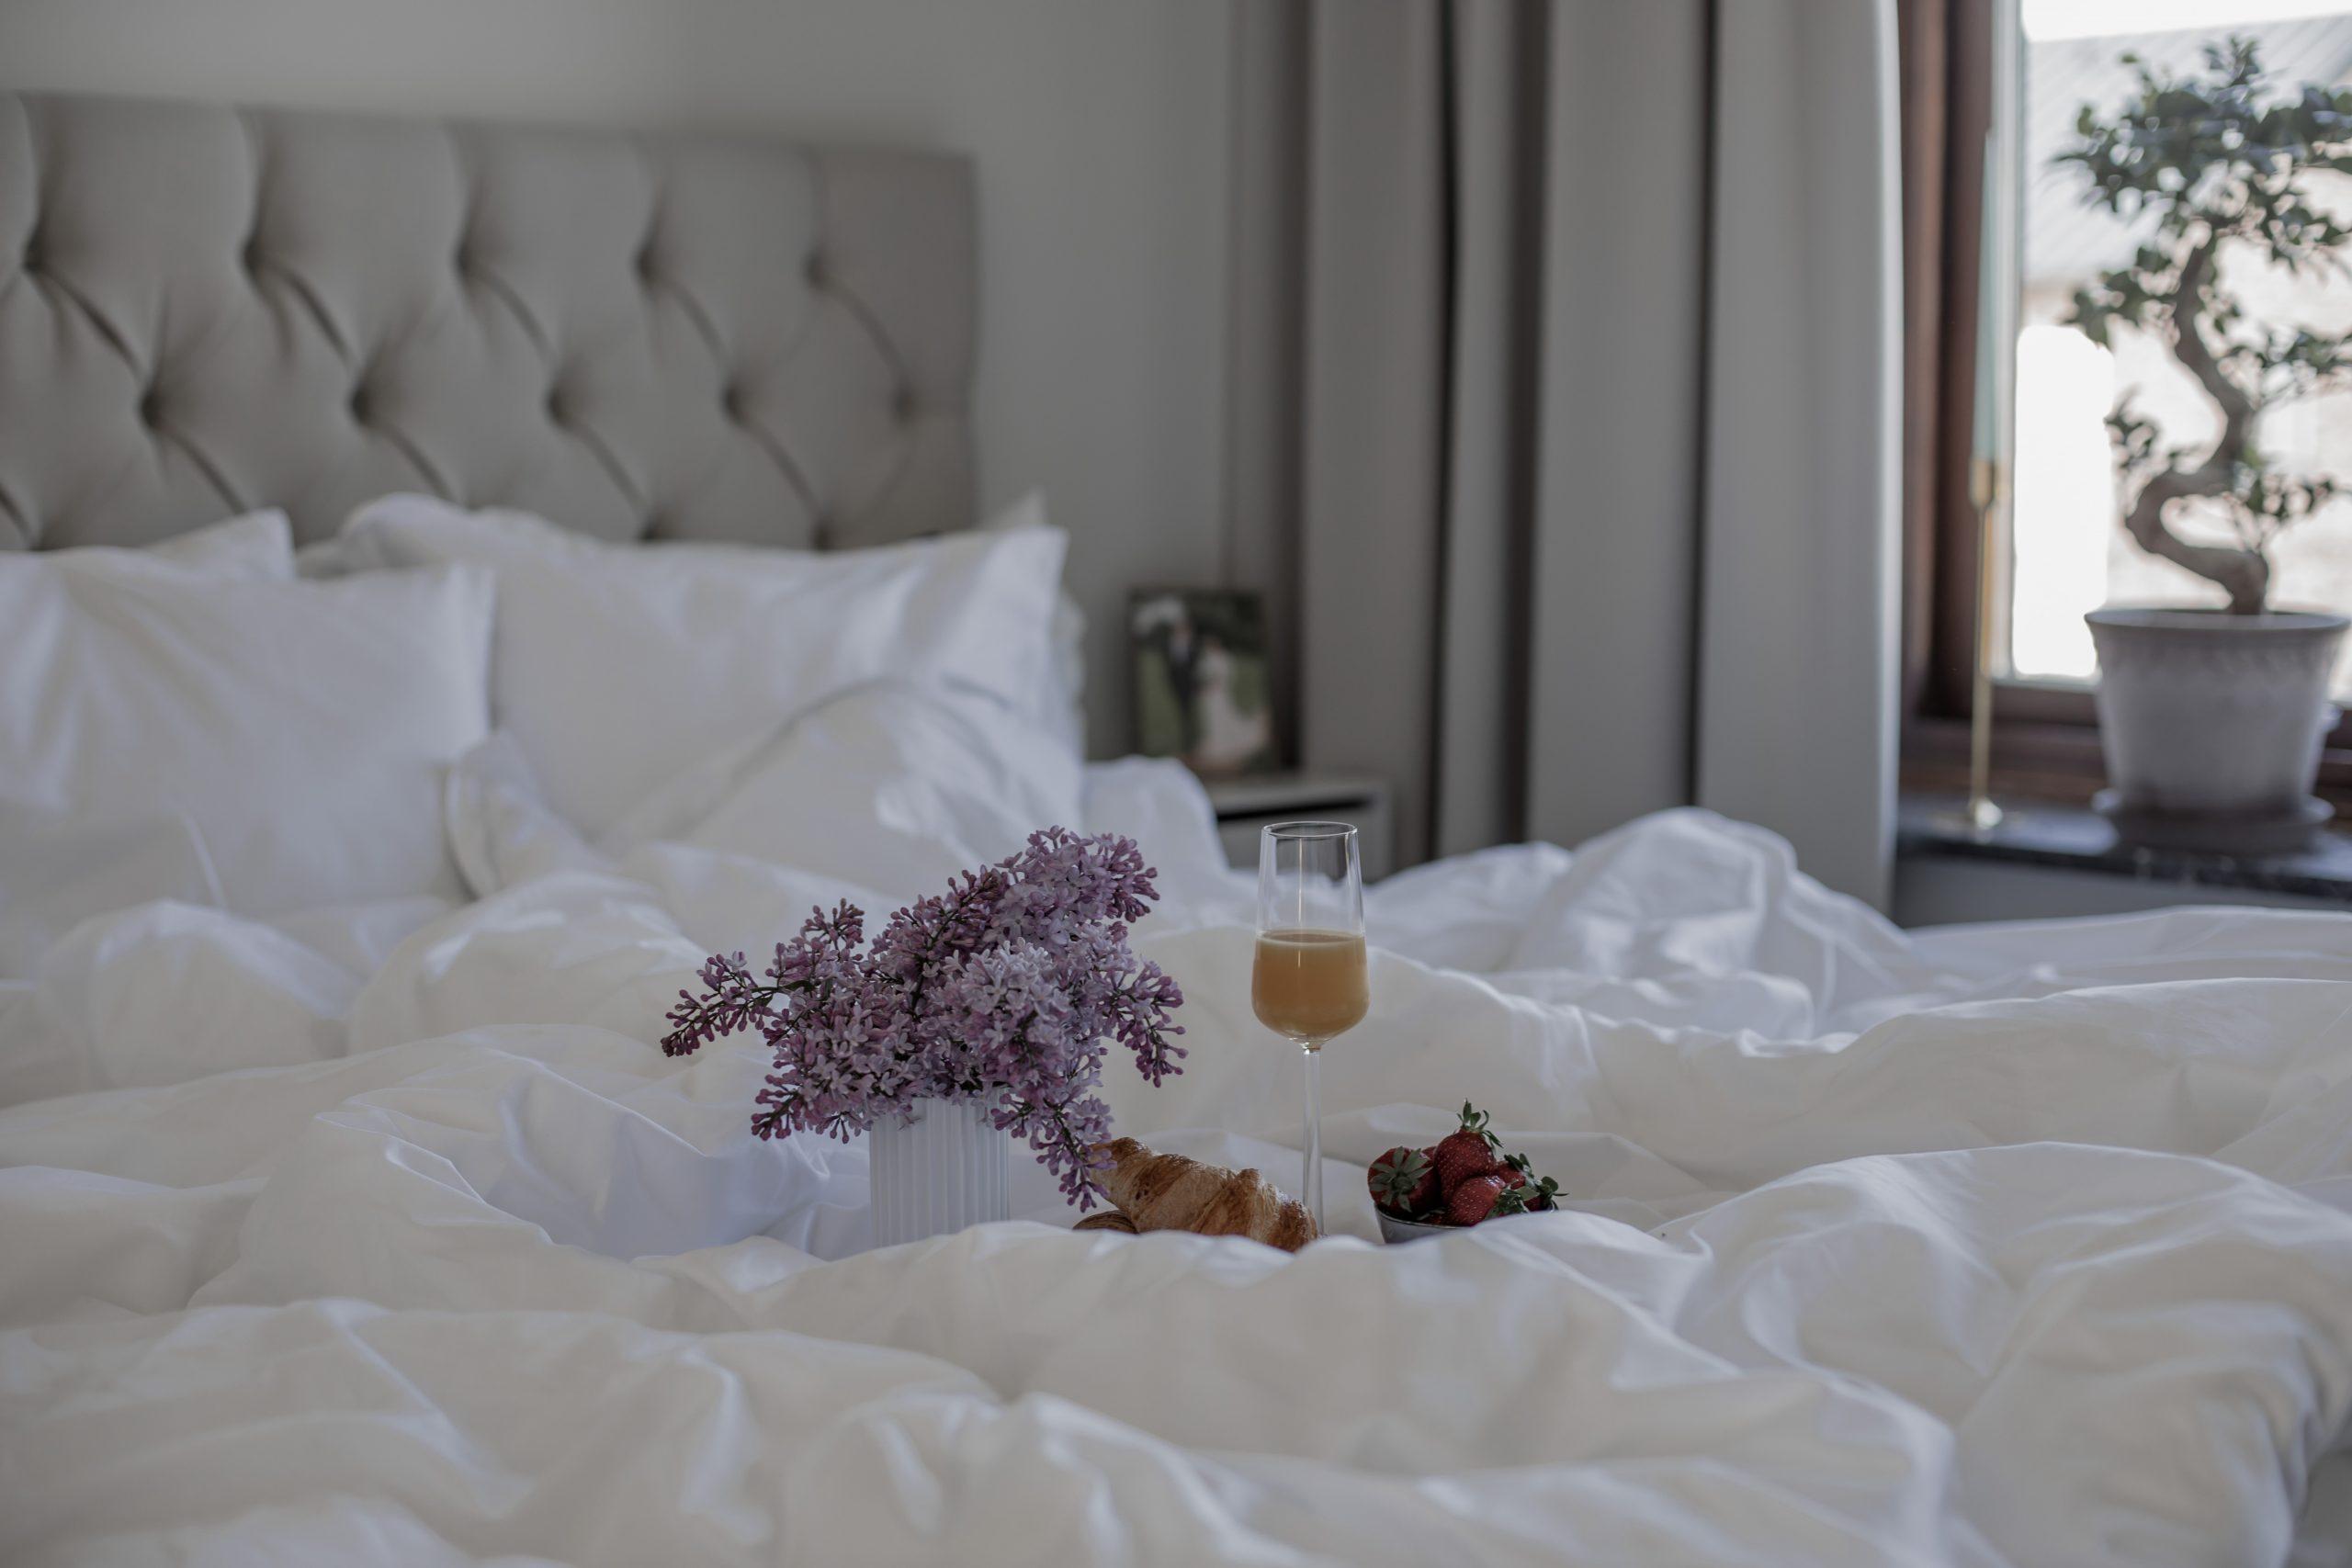 Påslakanset med hotellkänsla